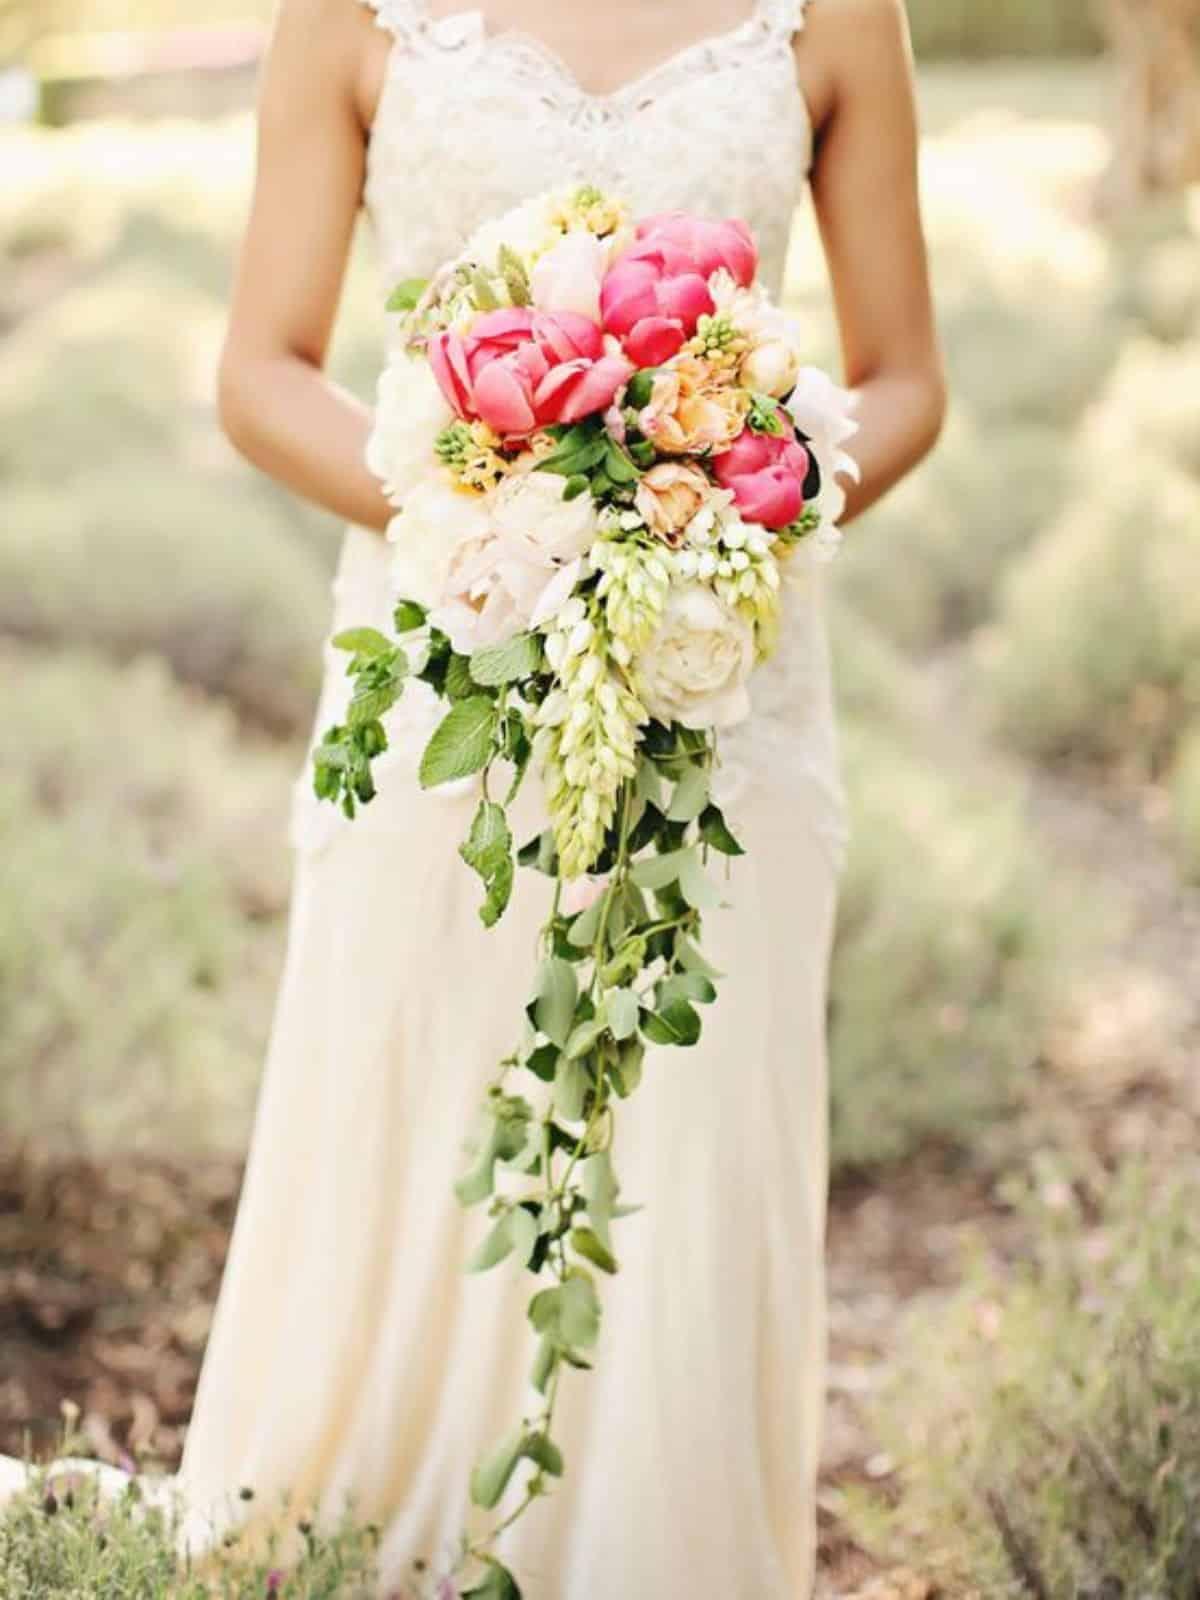 waterfall-shaped wedding bouquets